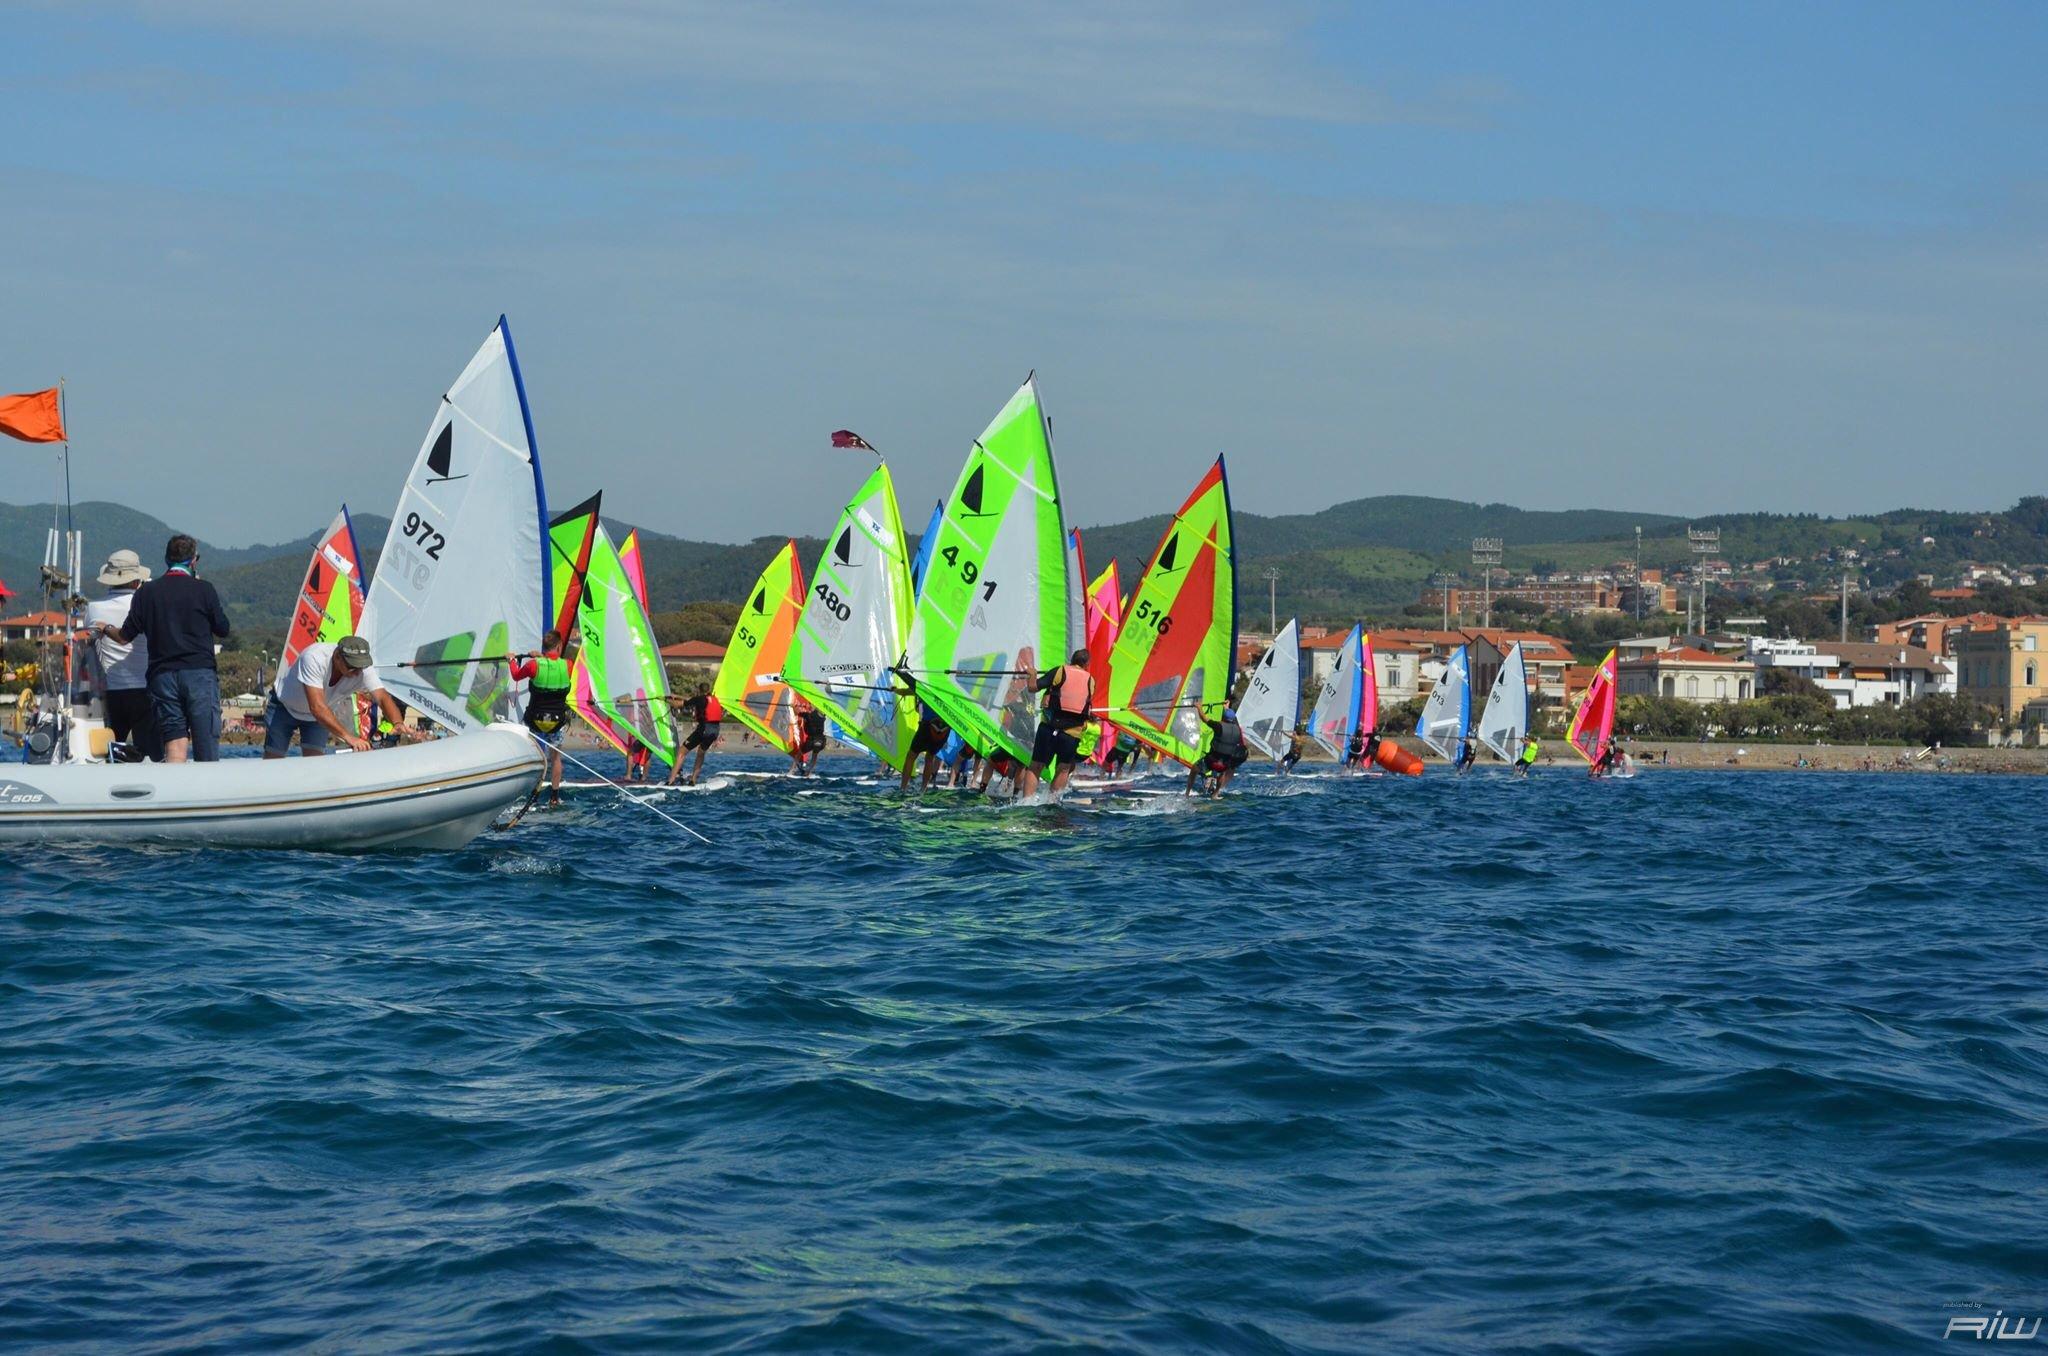 Classe windsurfer la nuova tavola windsurfer lt riwmag - Tavole da windsurf usate ...